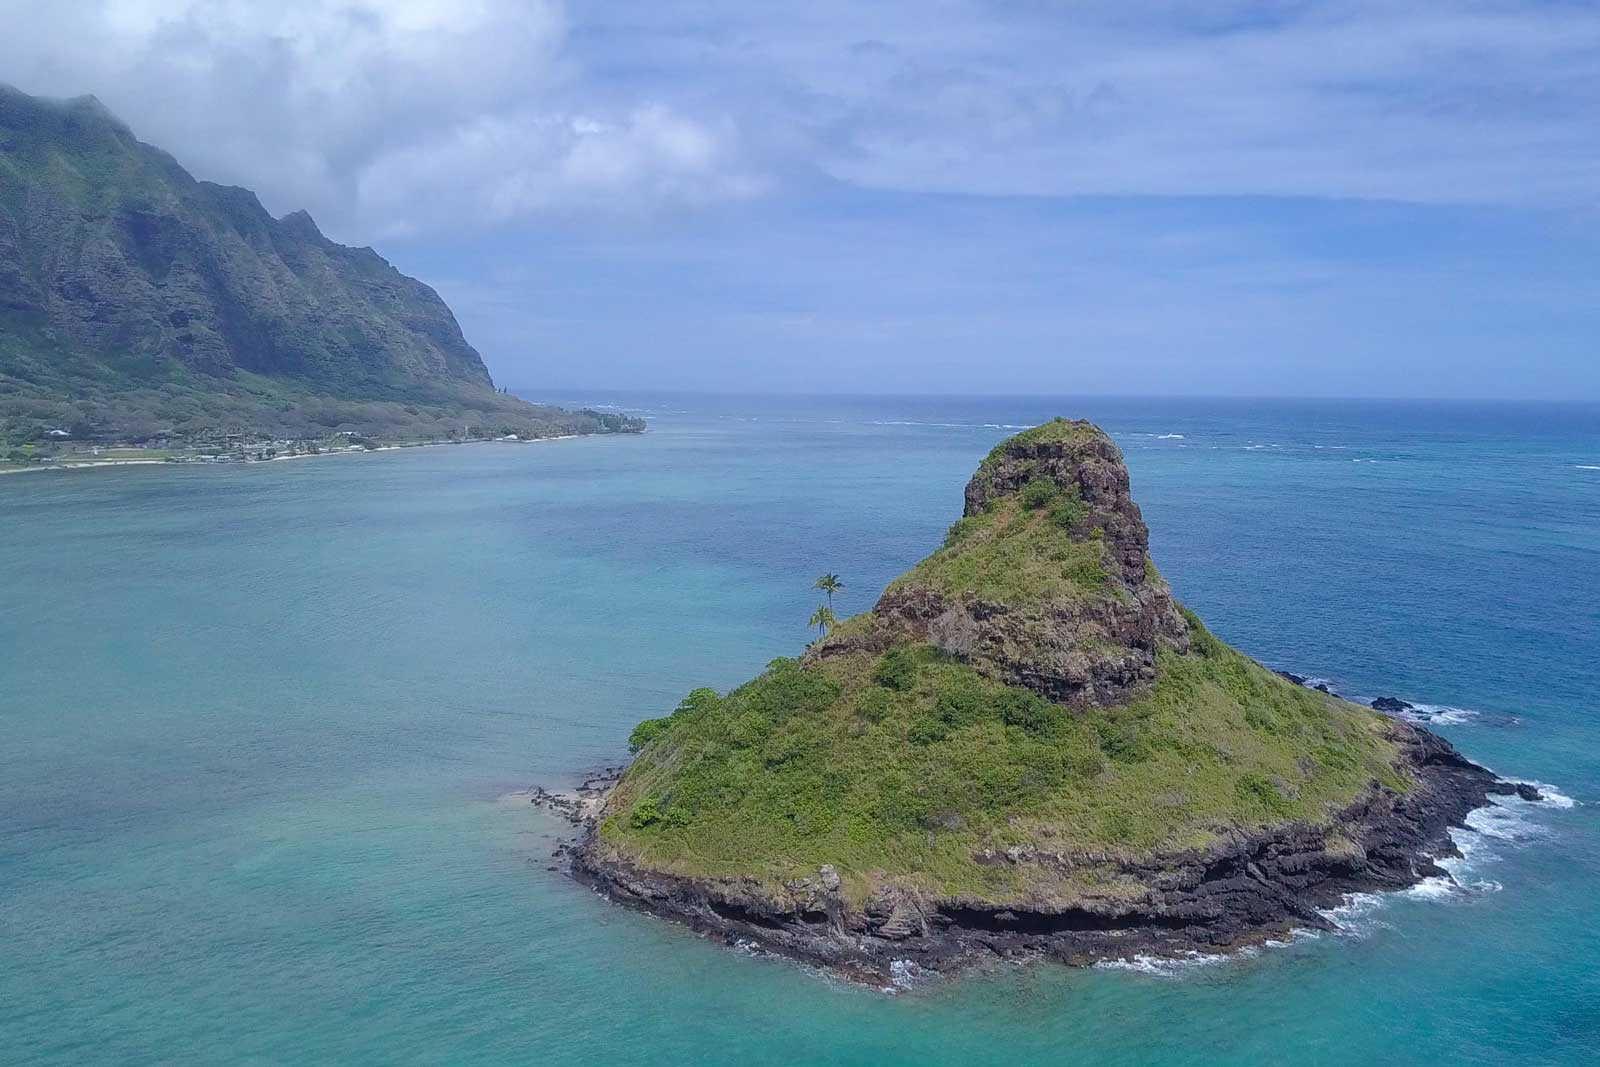 hawaii_ile_2.jpg